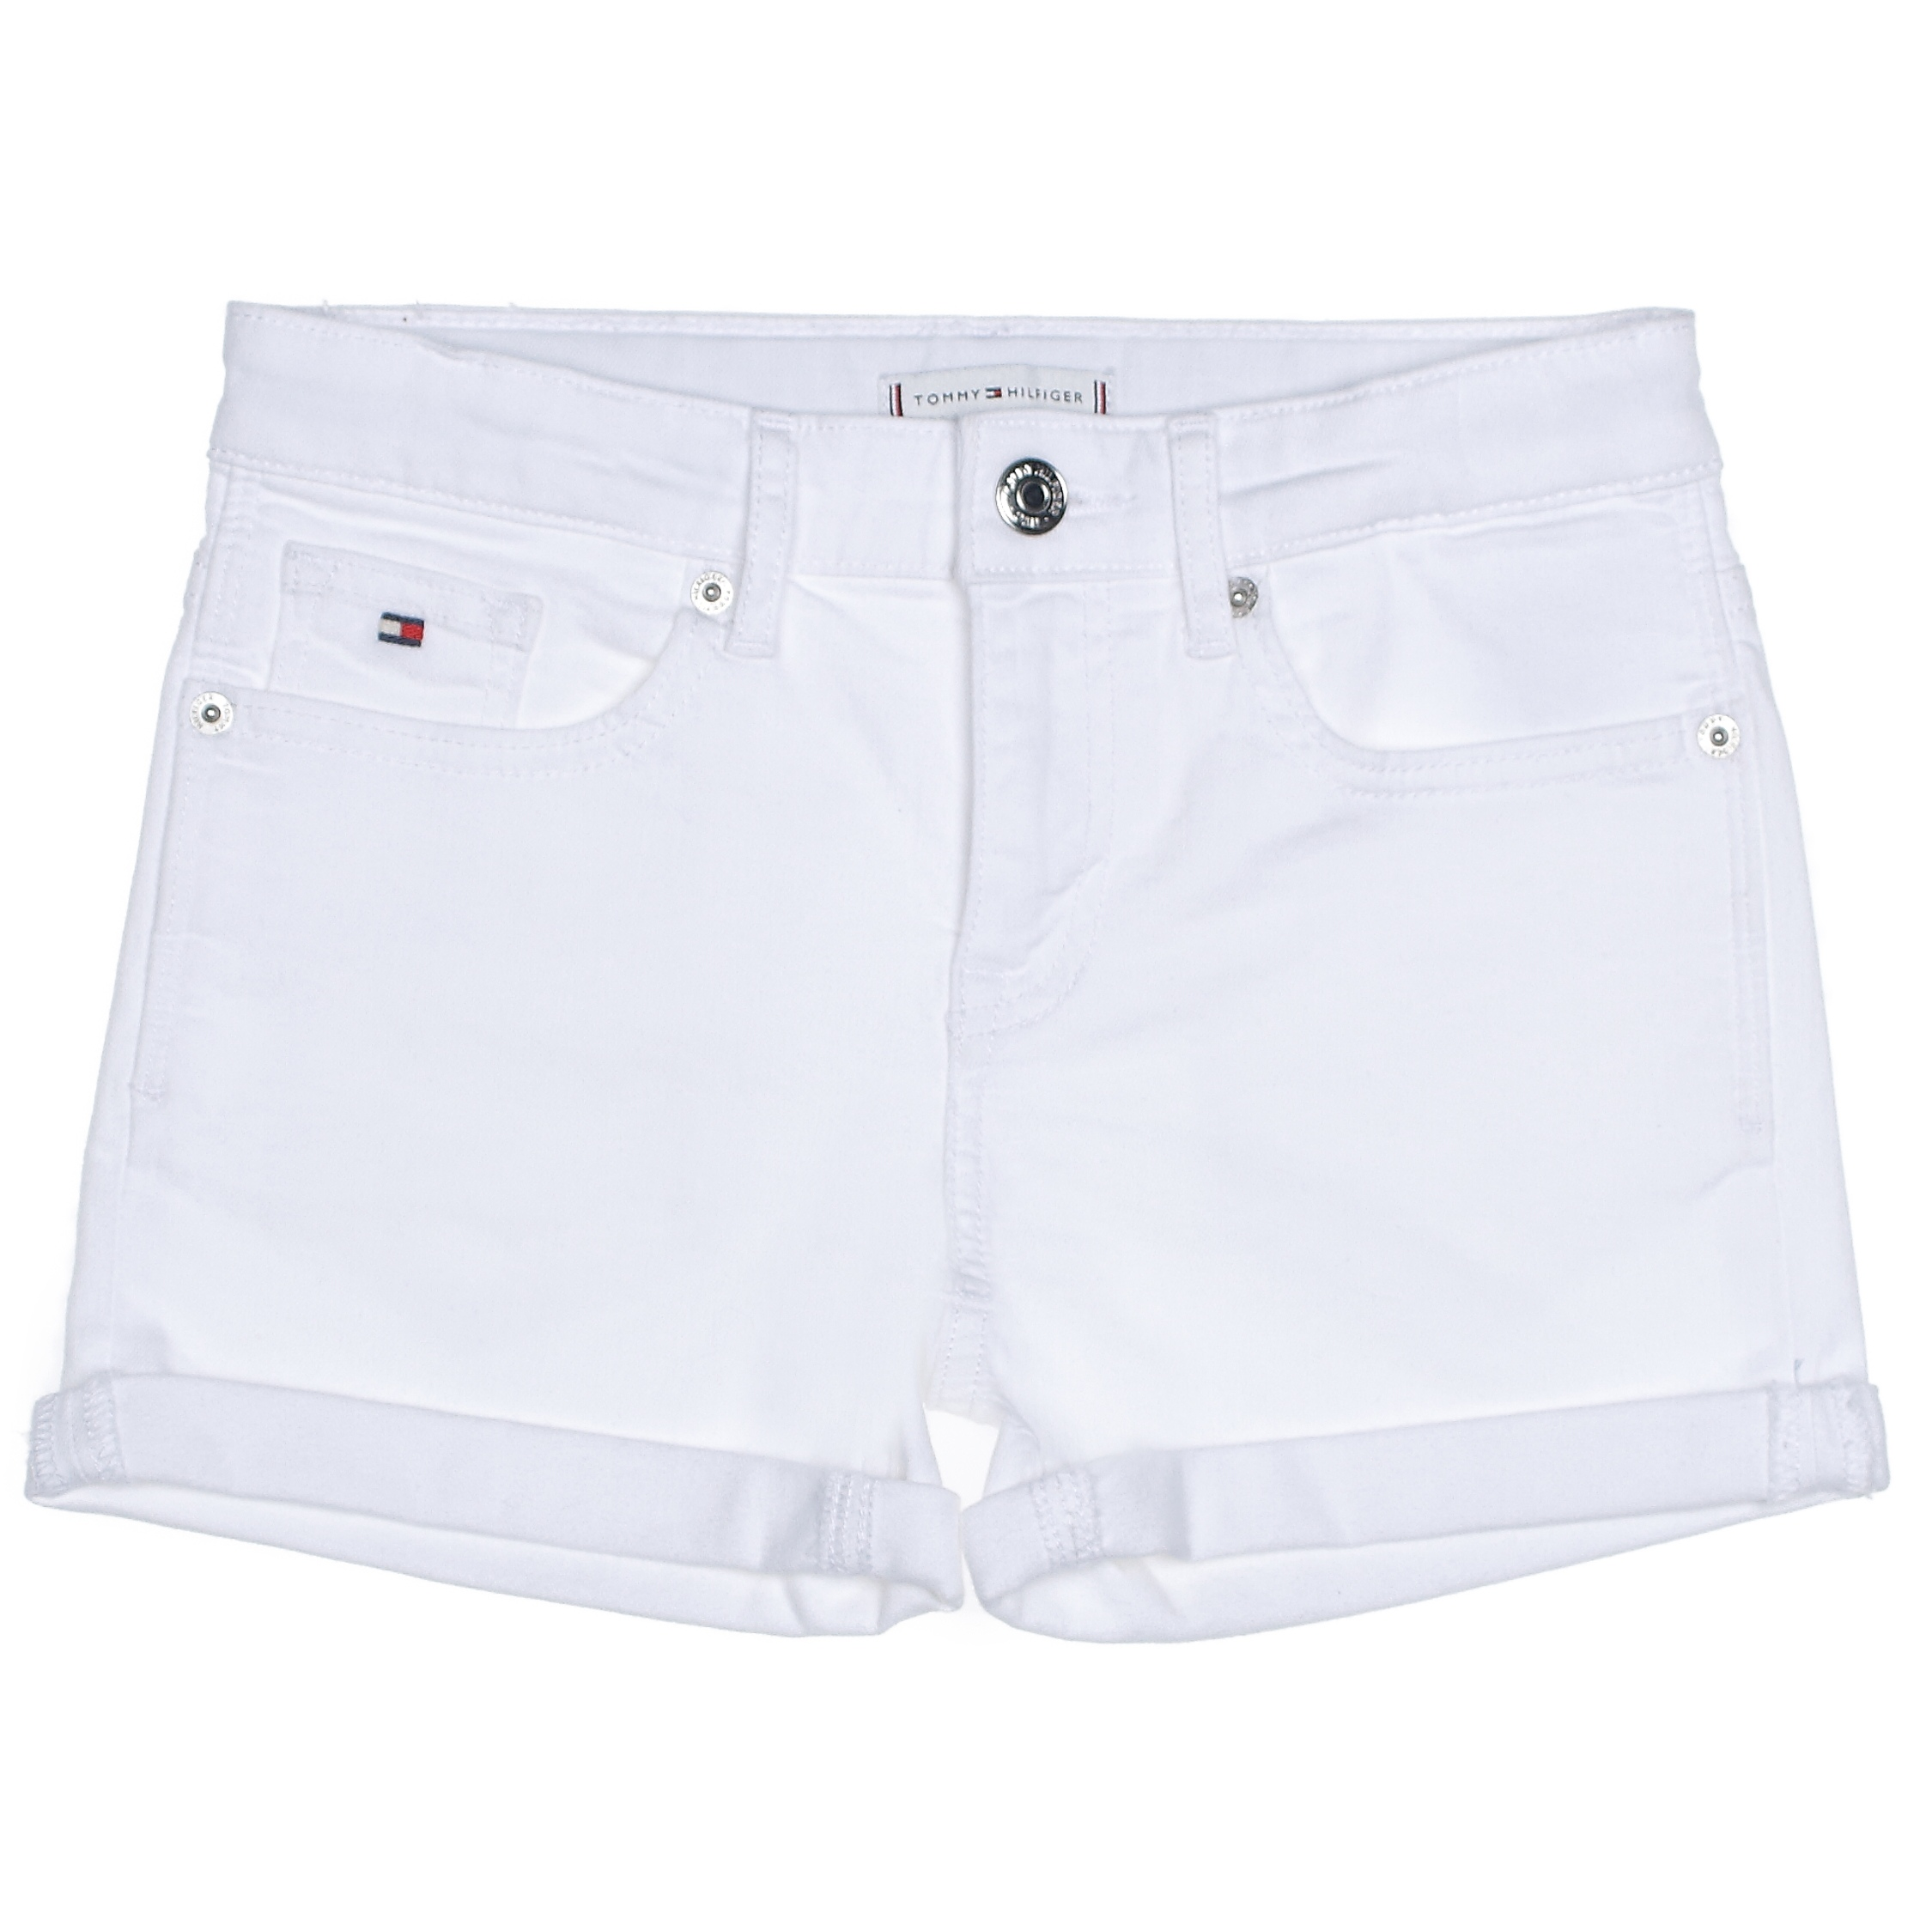 http://www.leadermode.com/190883/tommy-hilfiger-kg0kg04369-nora-short-123-bright-white.jpg